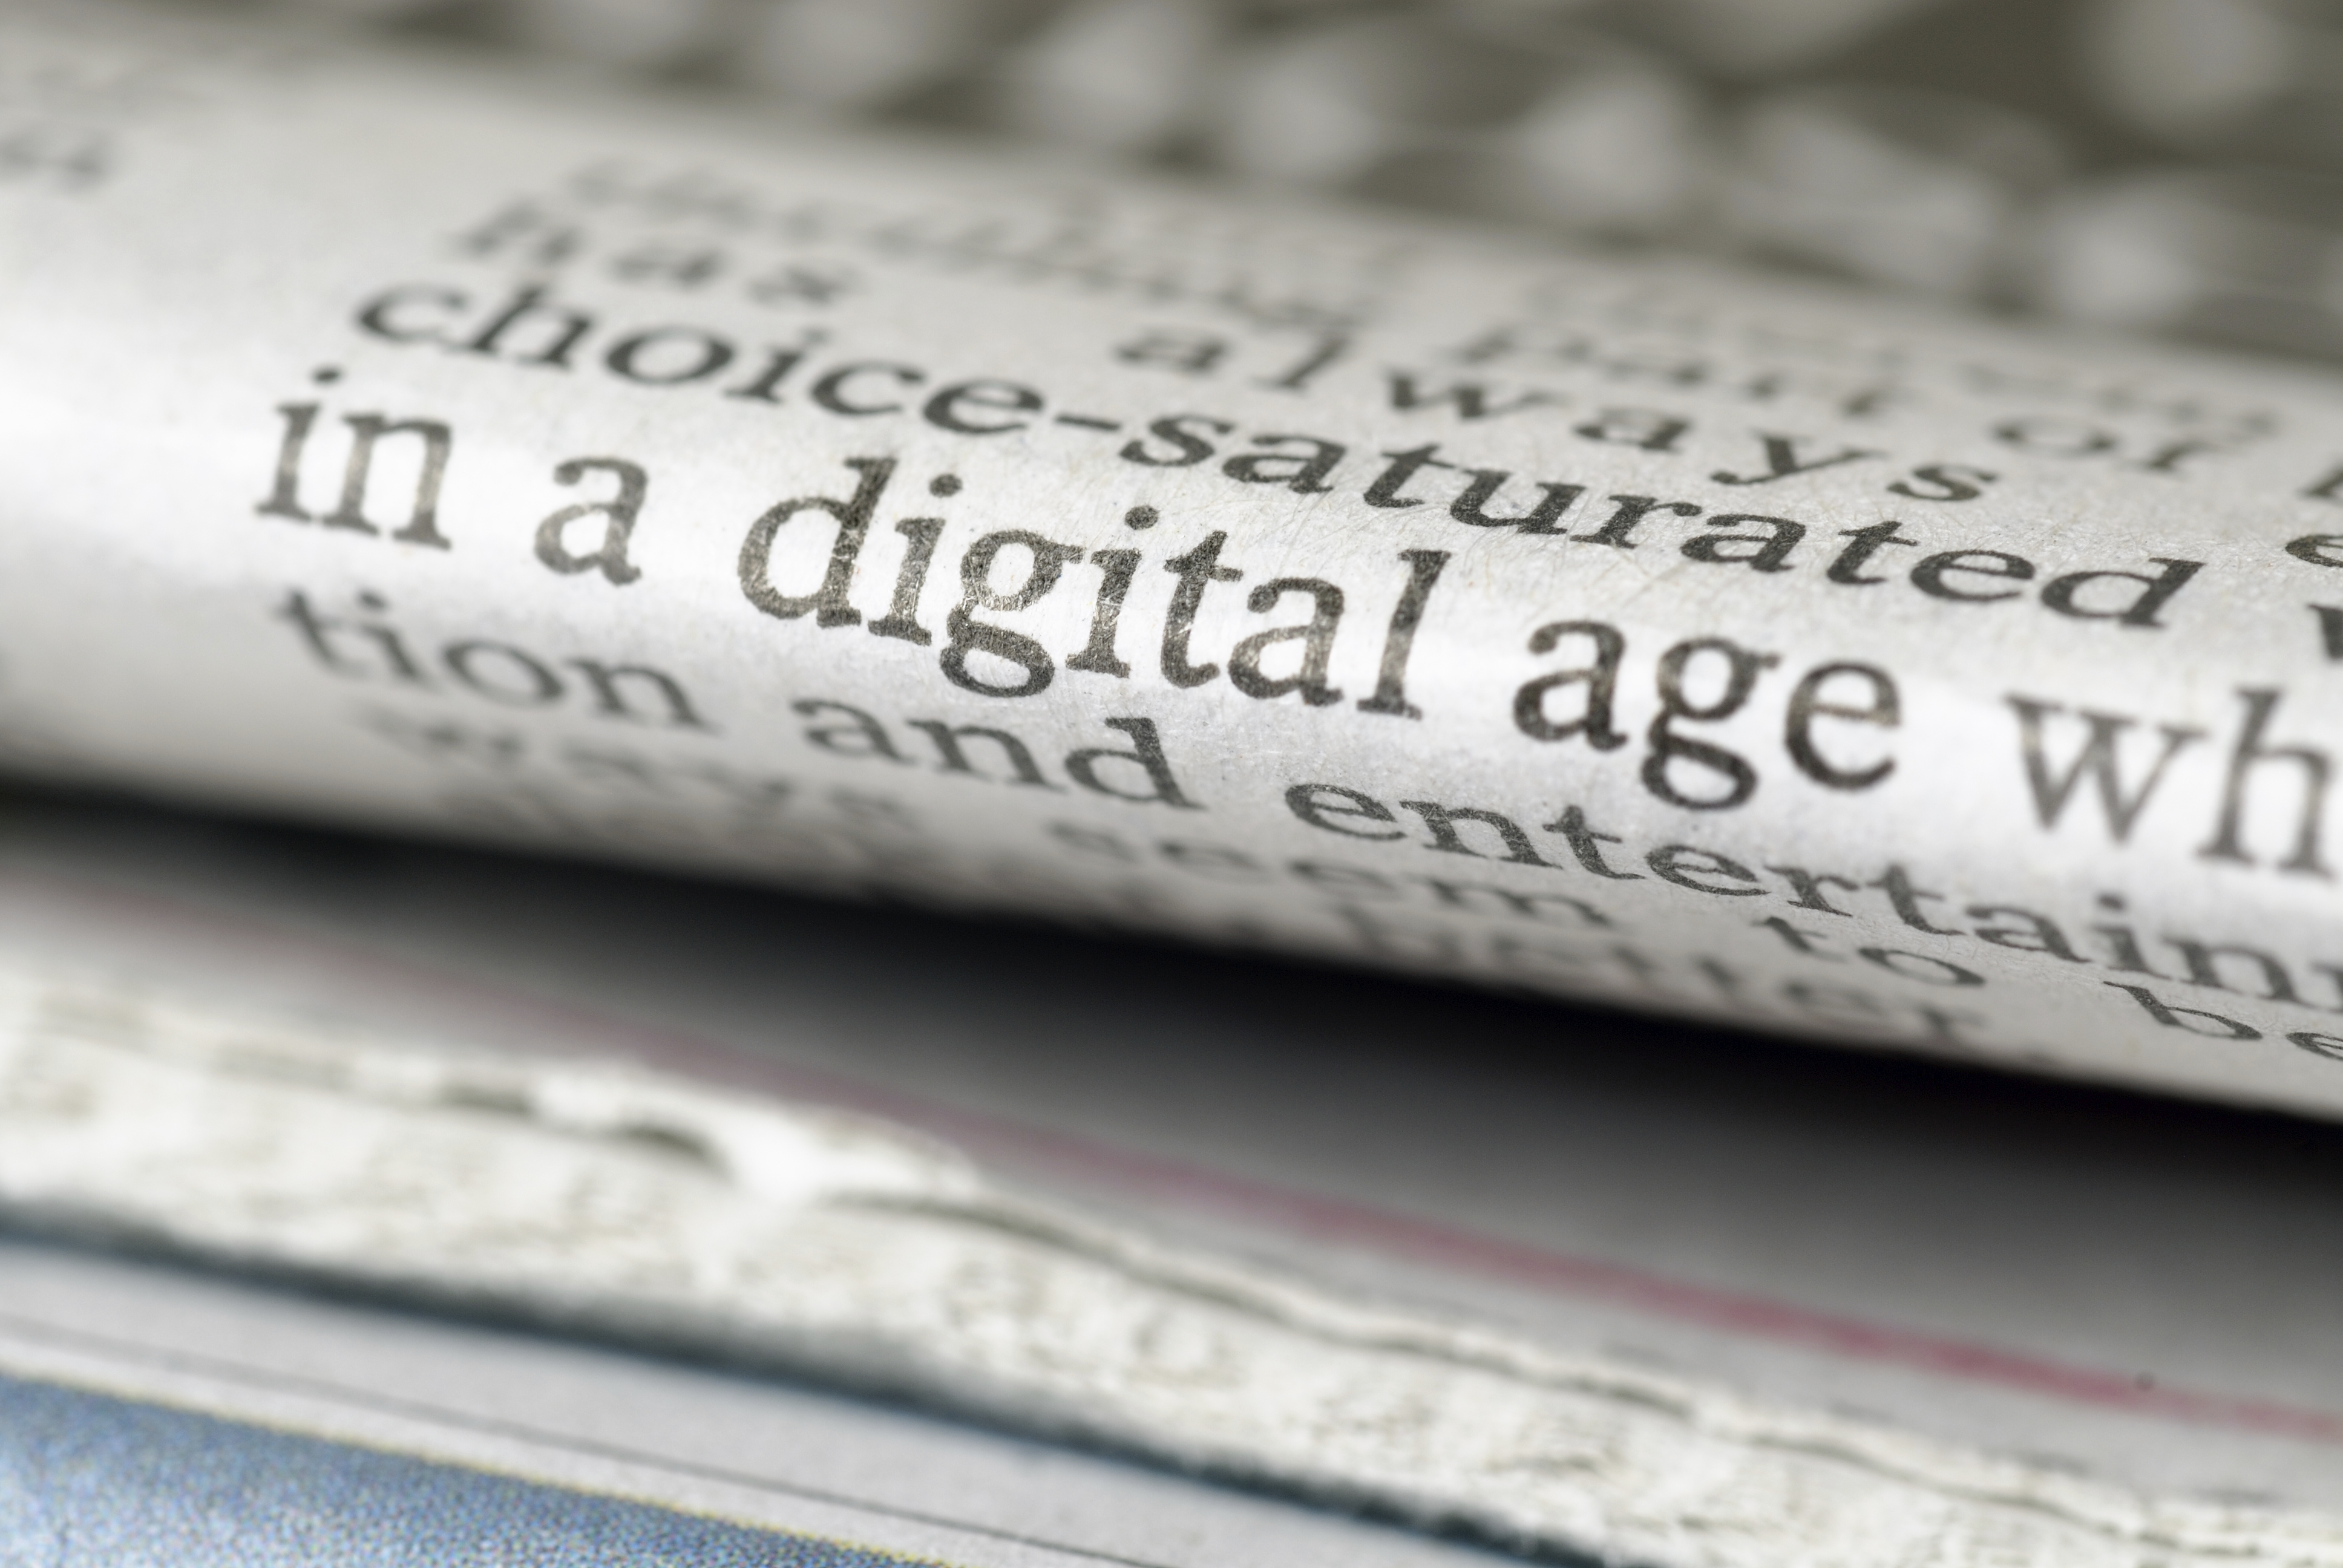 Navigating the digital disruption, again